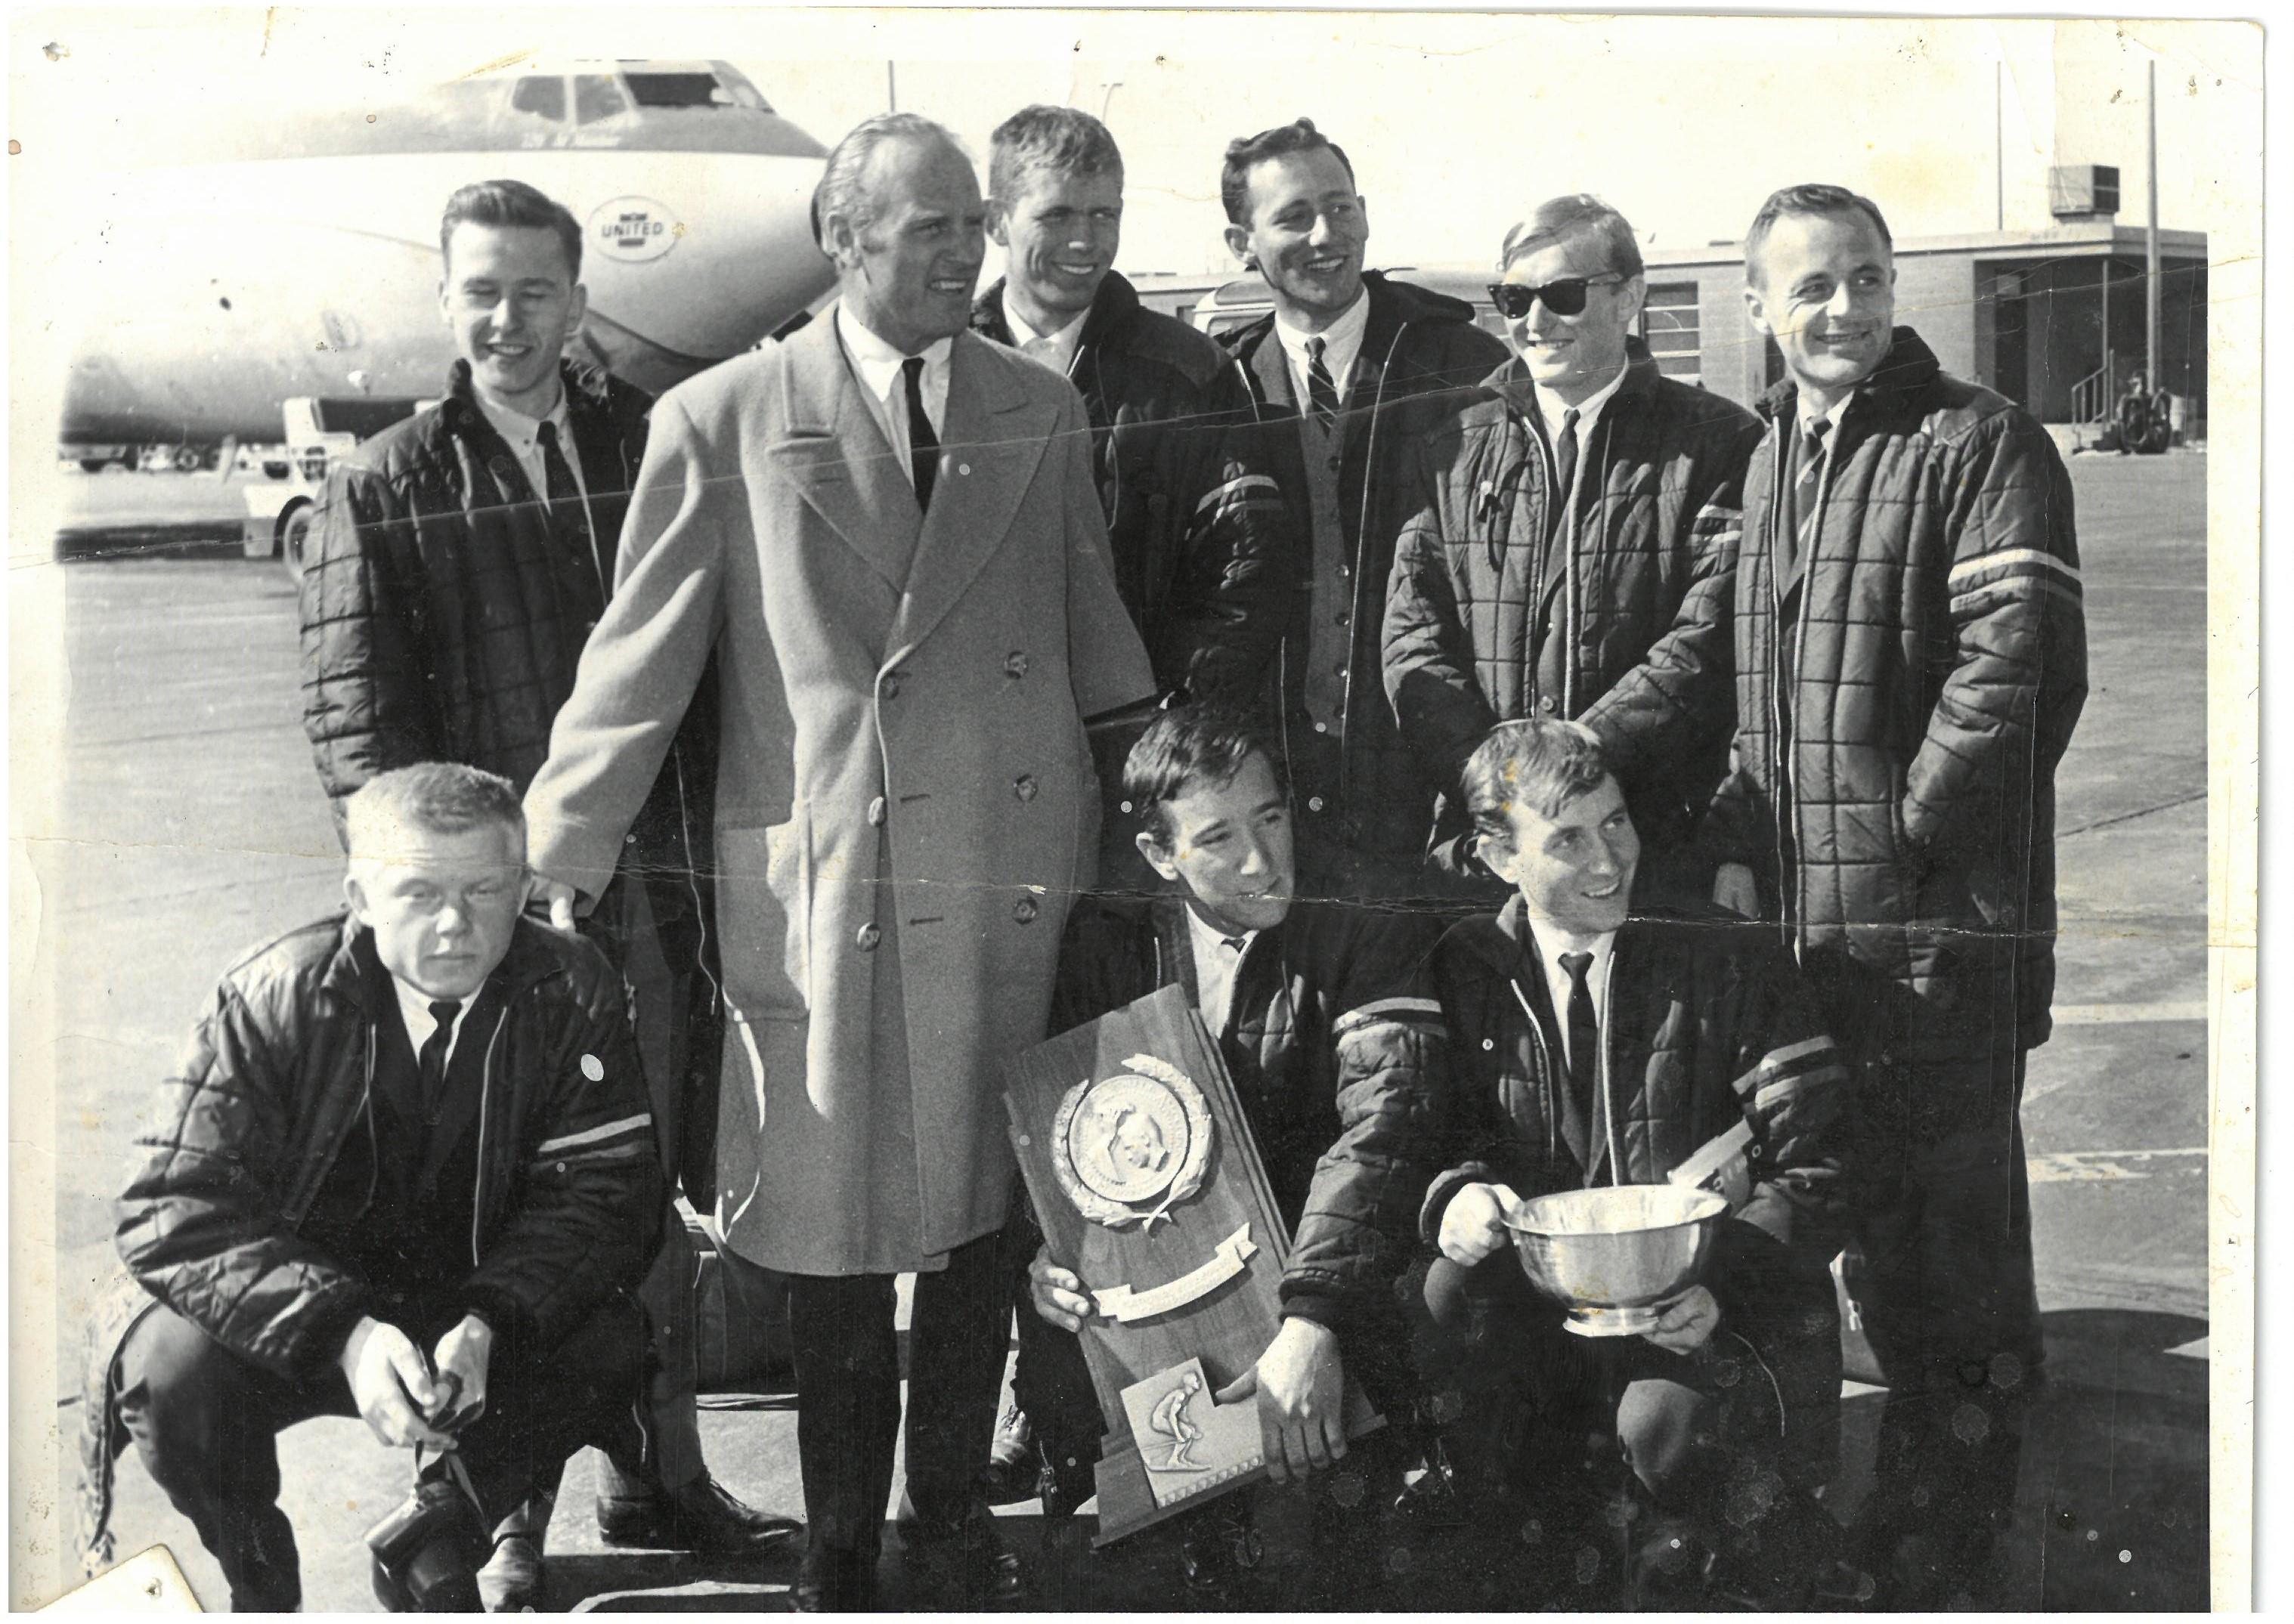 https://fasterskier.com/wp-content/blogs.dir/1/files/2017/05/1964-NCAA-laget-på-Logan-Airport.-Boston.jpg